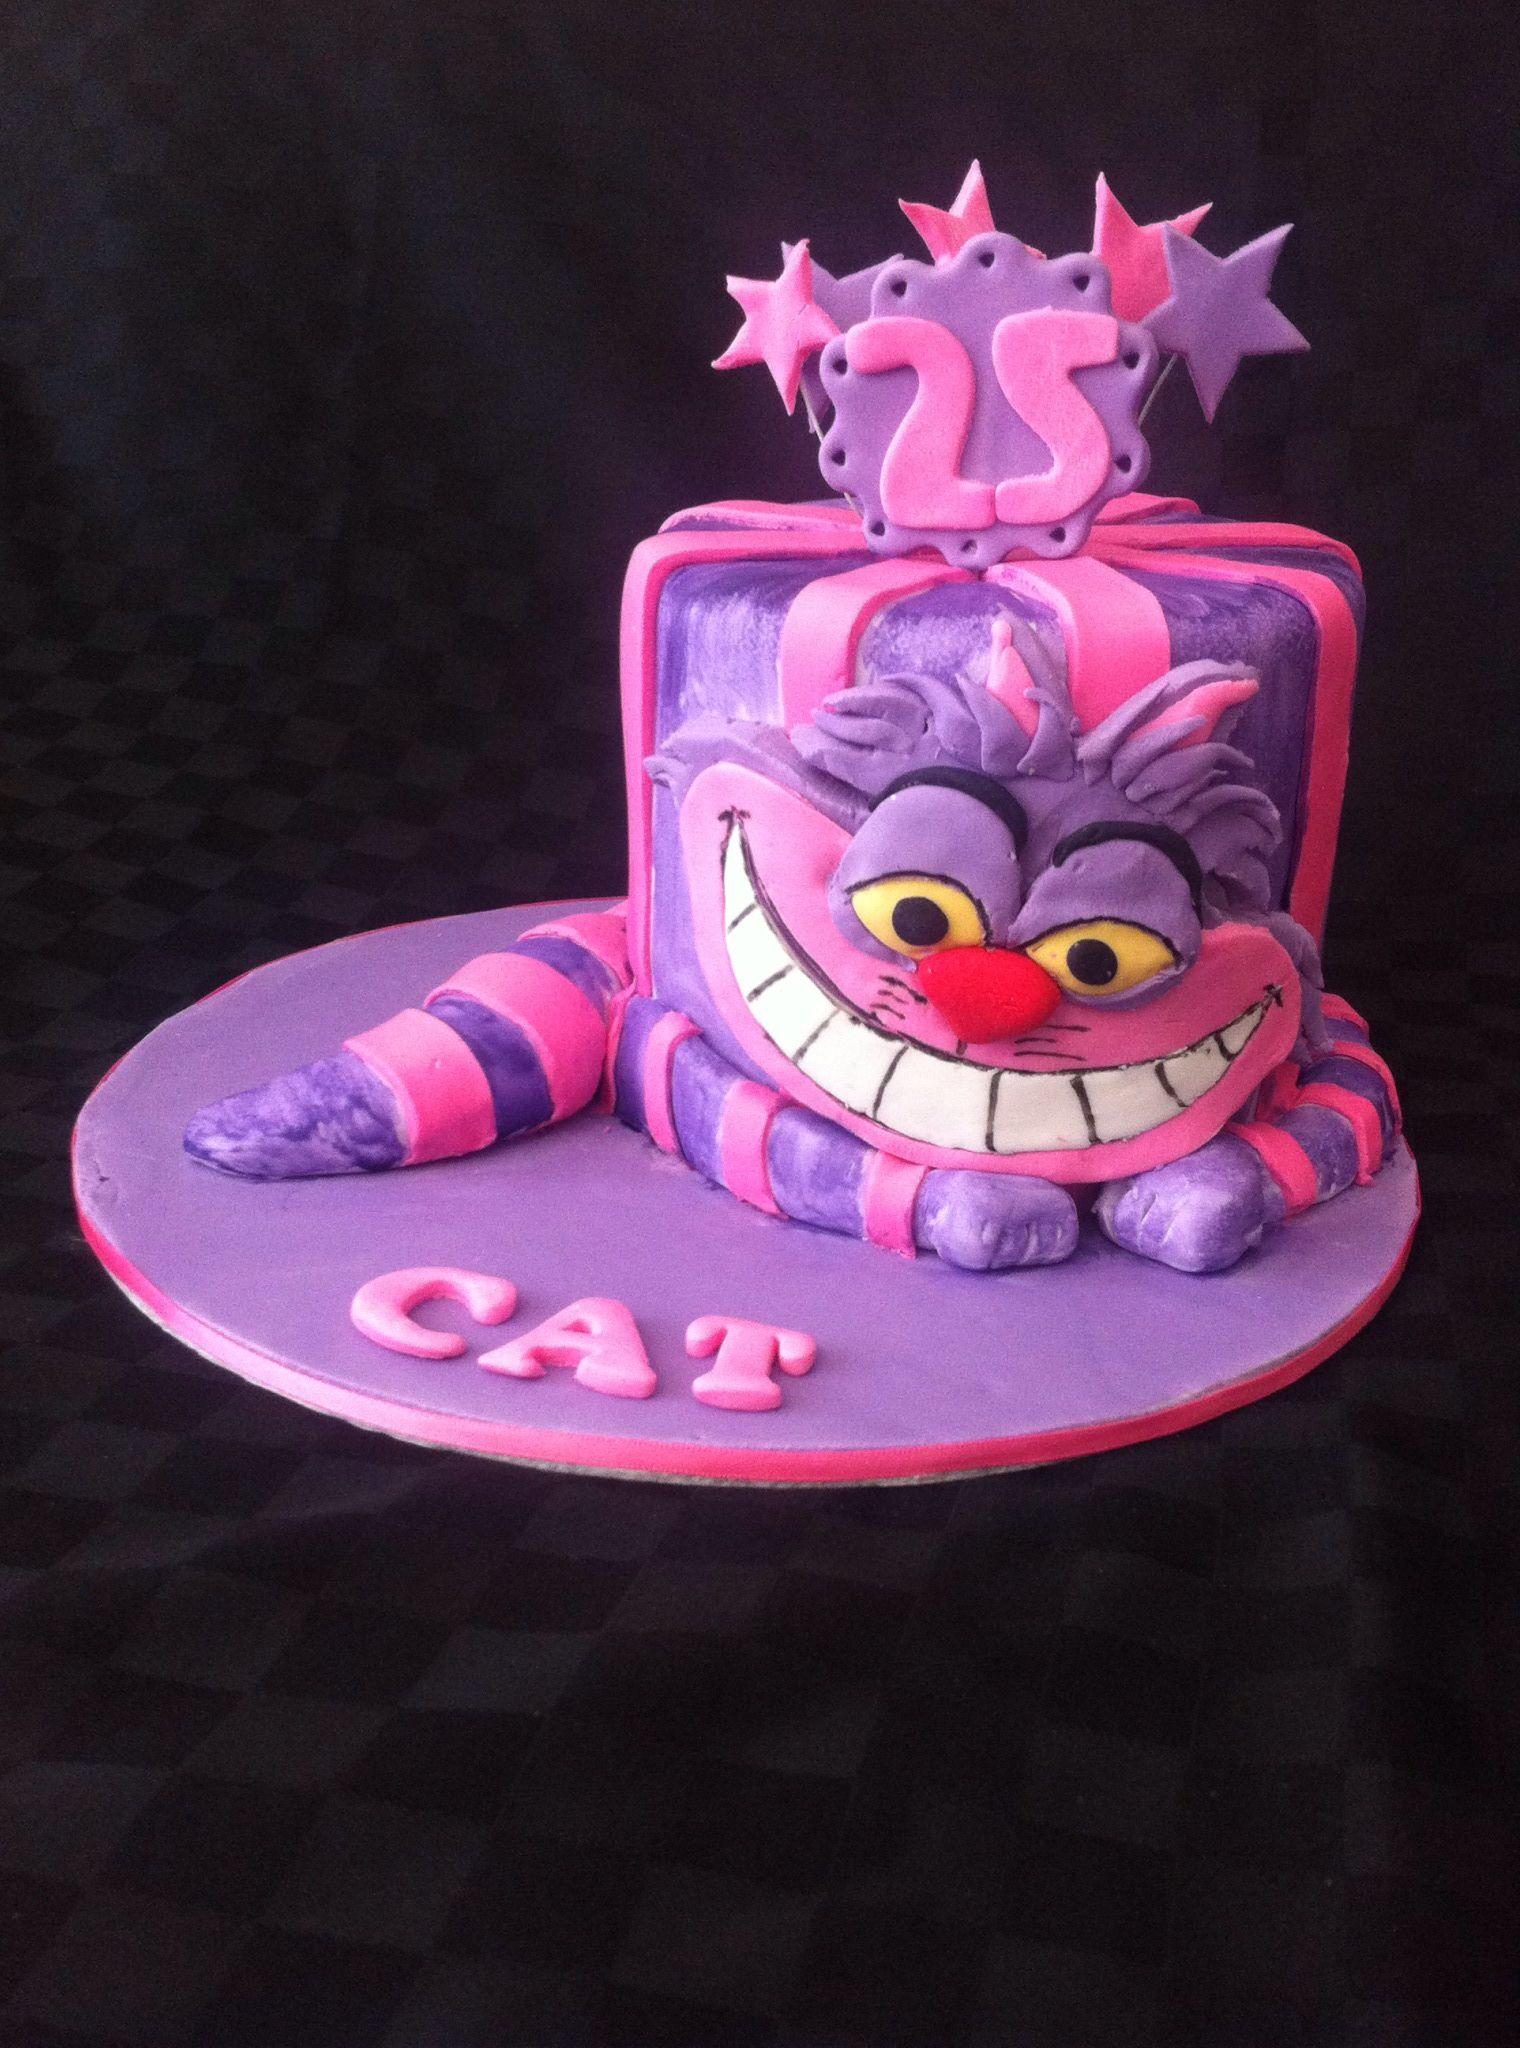 Coxies cakes custom cakes minnie cake decorating